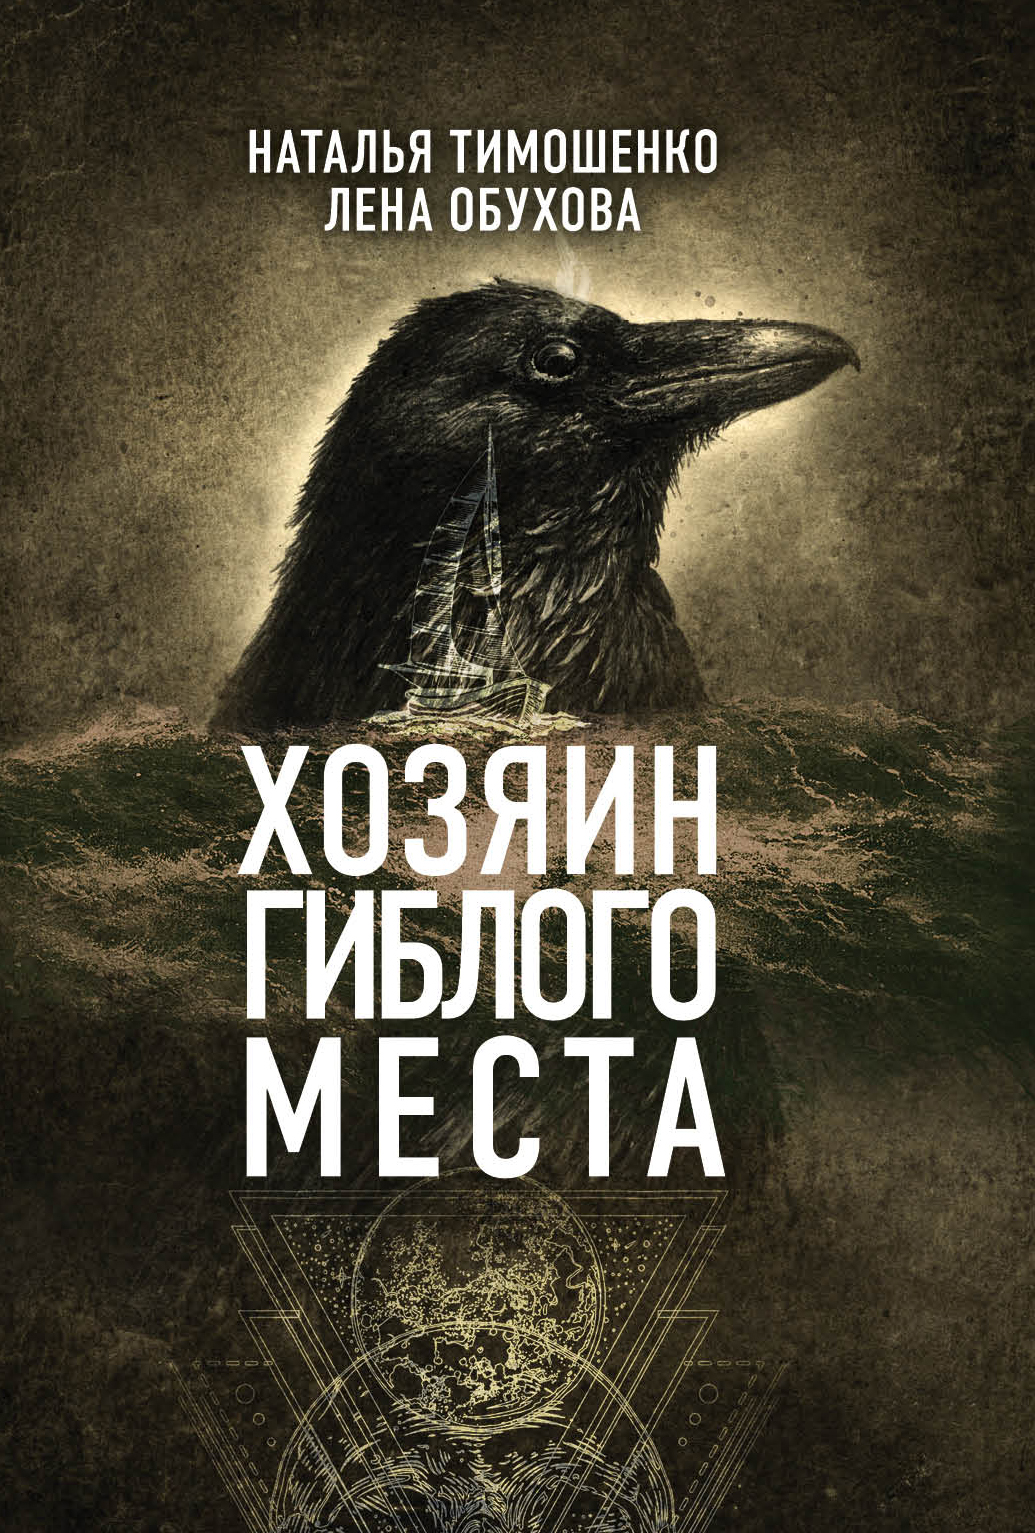 Тимошенко Н.В., Обухова Е.А. Хозяин гиблого места хозяин уральской тайг